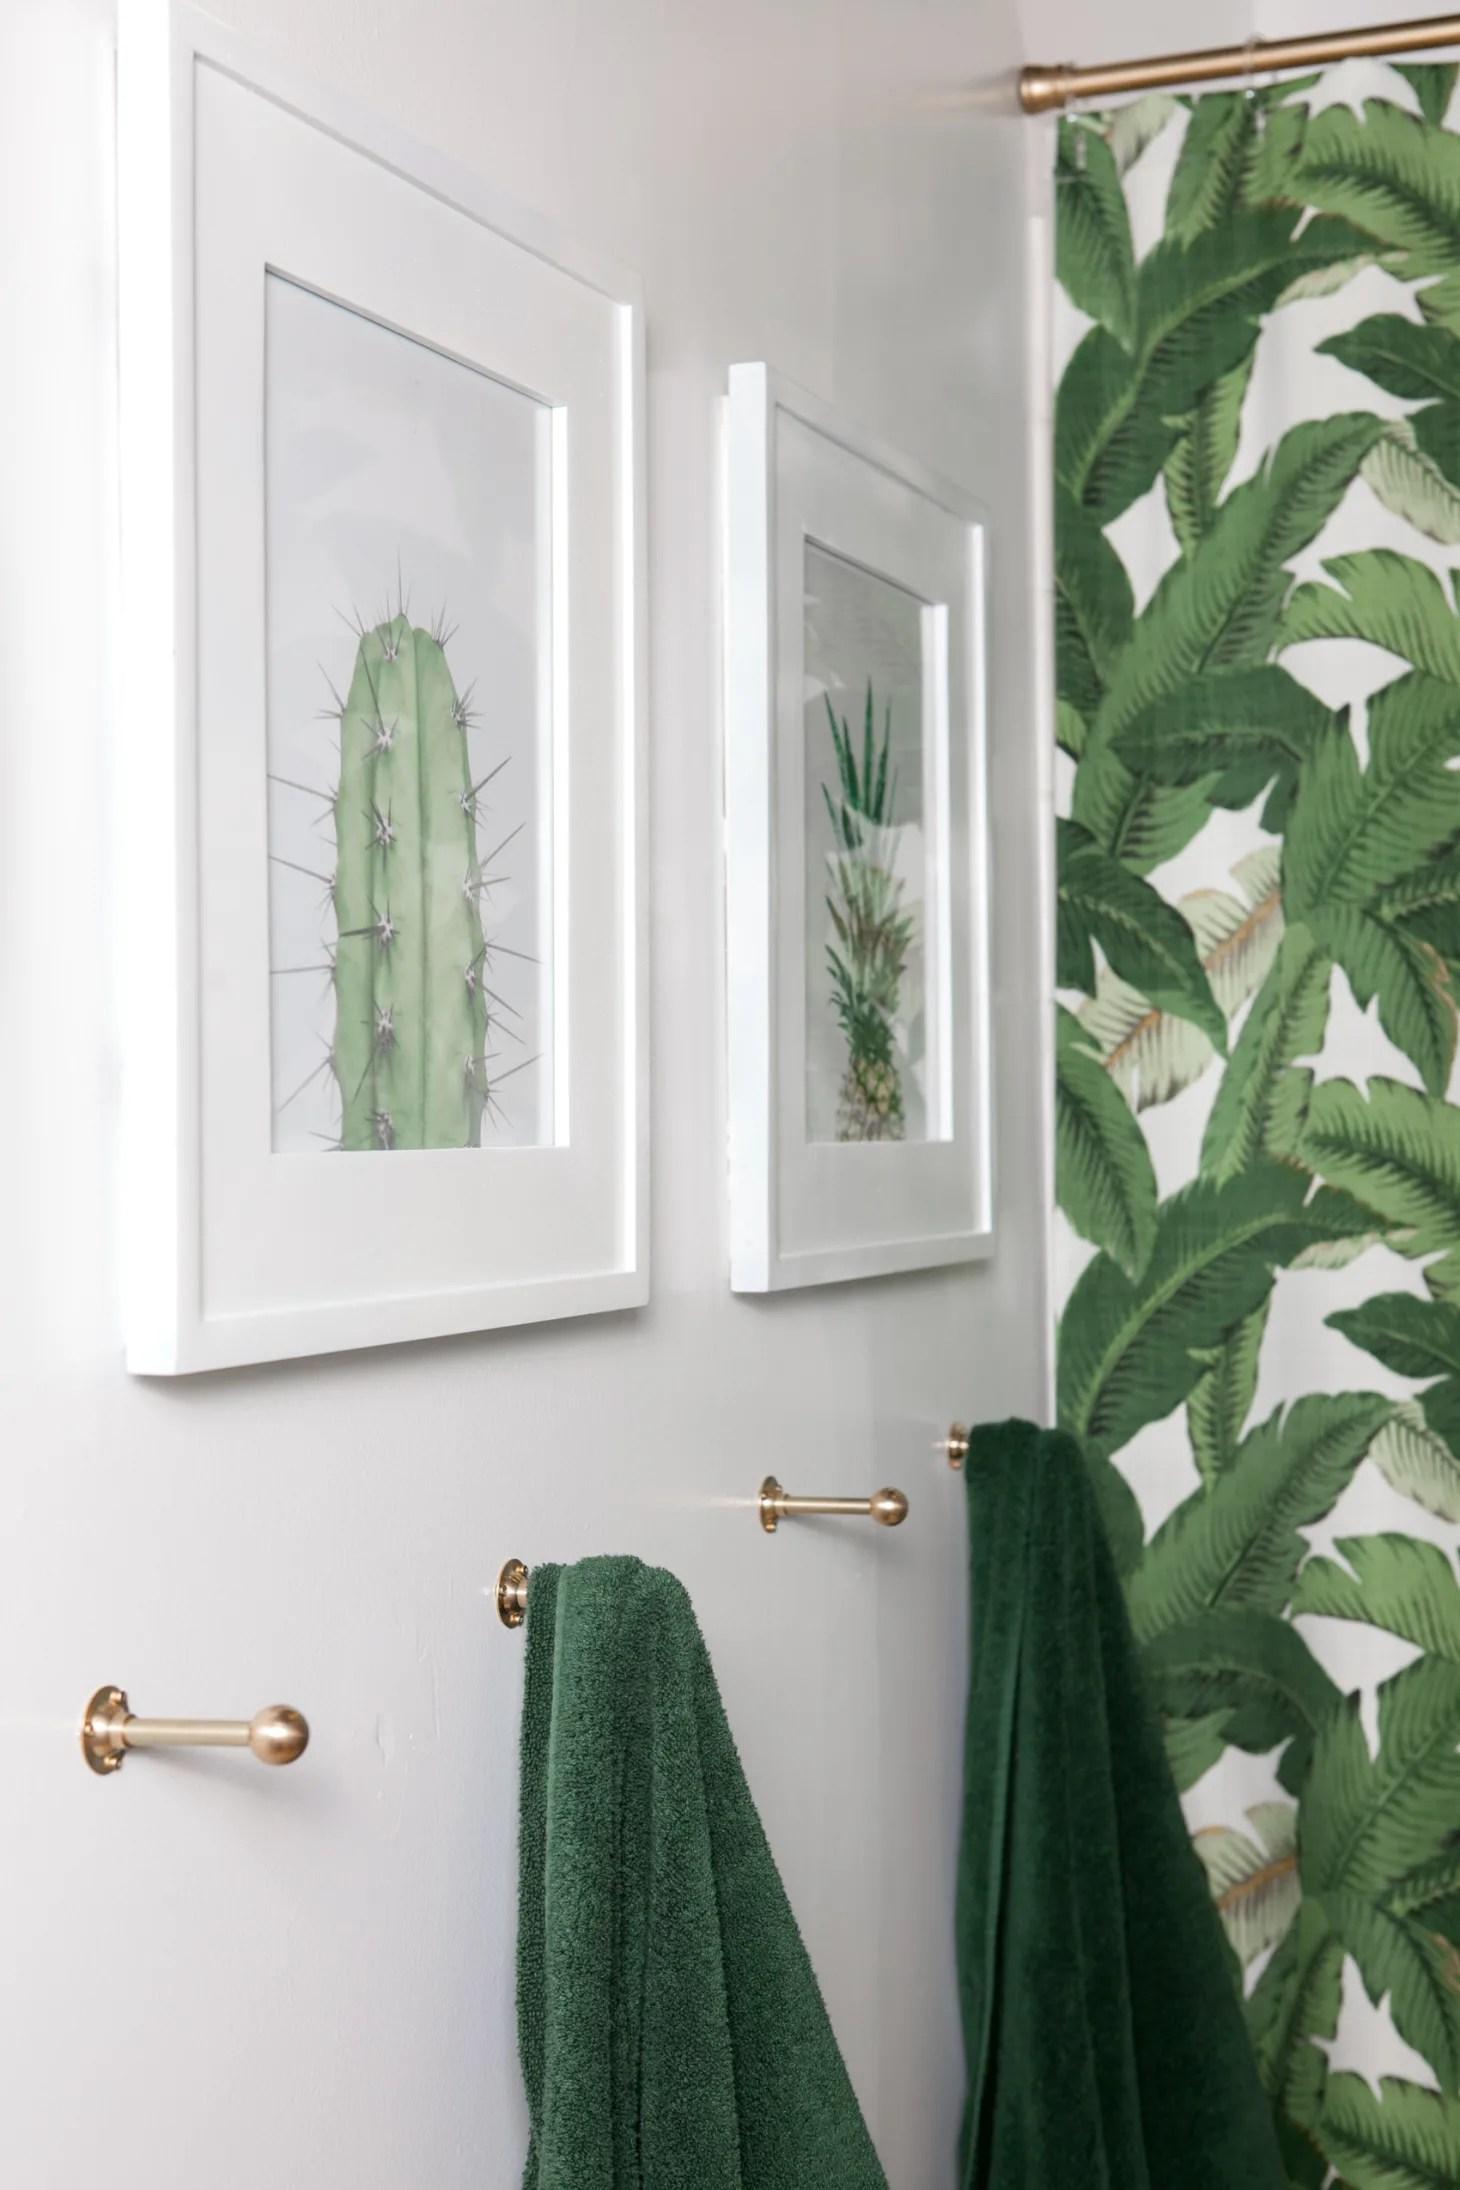 25 Small Bathroom Storage & Design Ideas - Storage ... on Small Apartment Bathroom Storage Ideas  id=42384